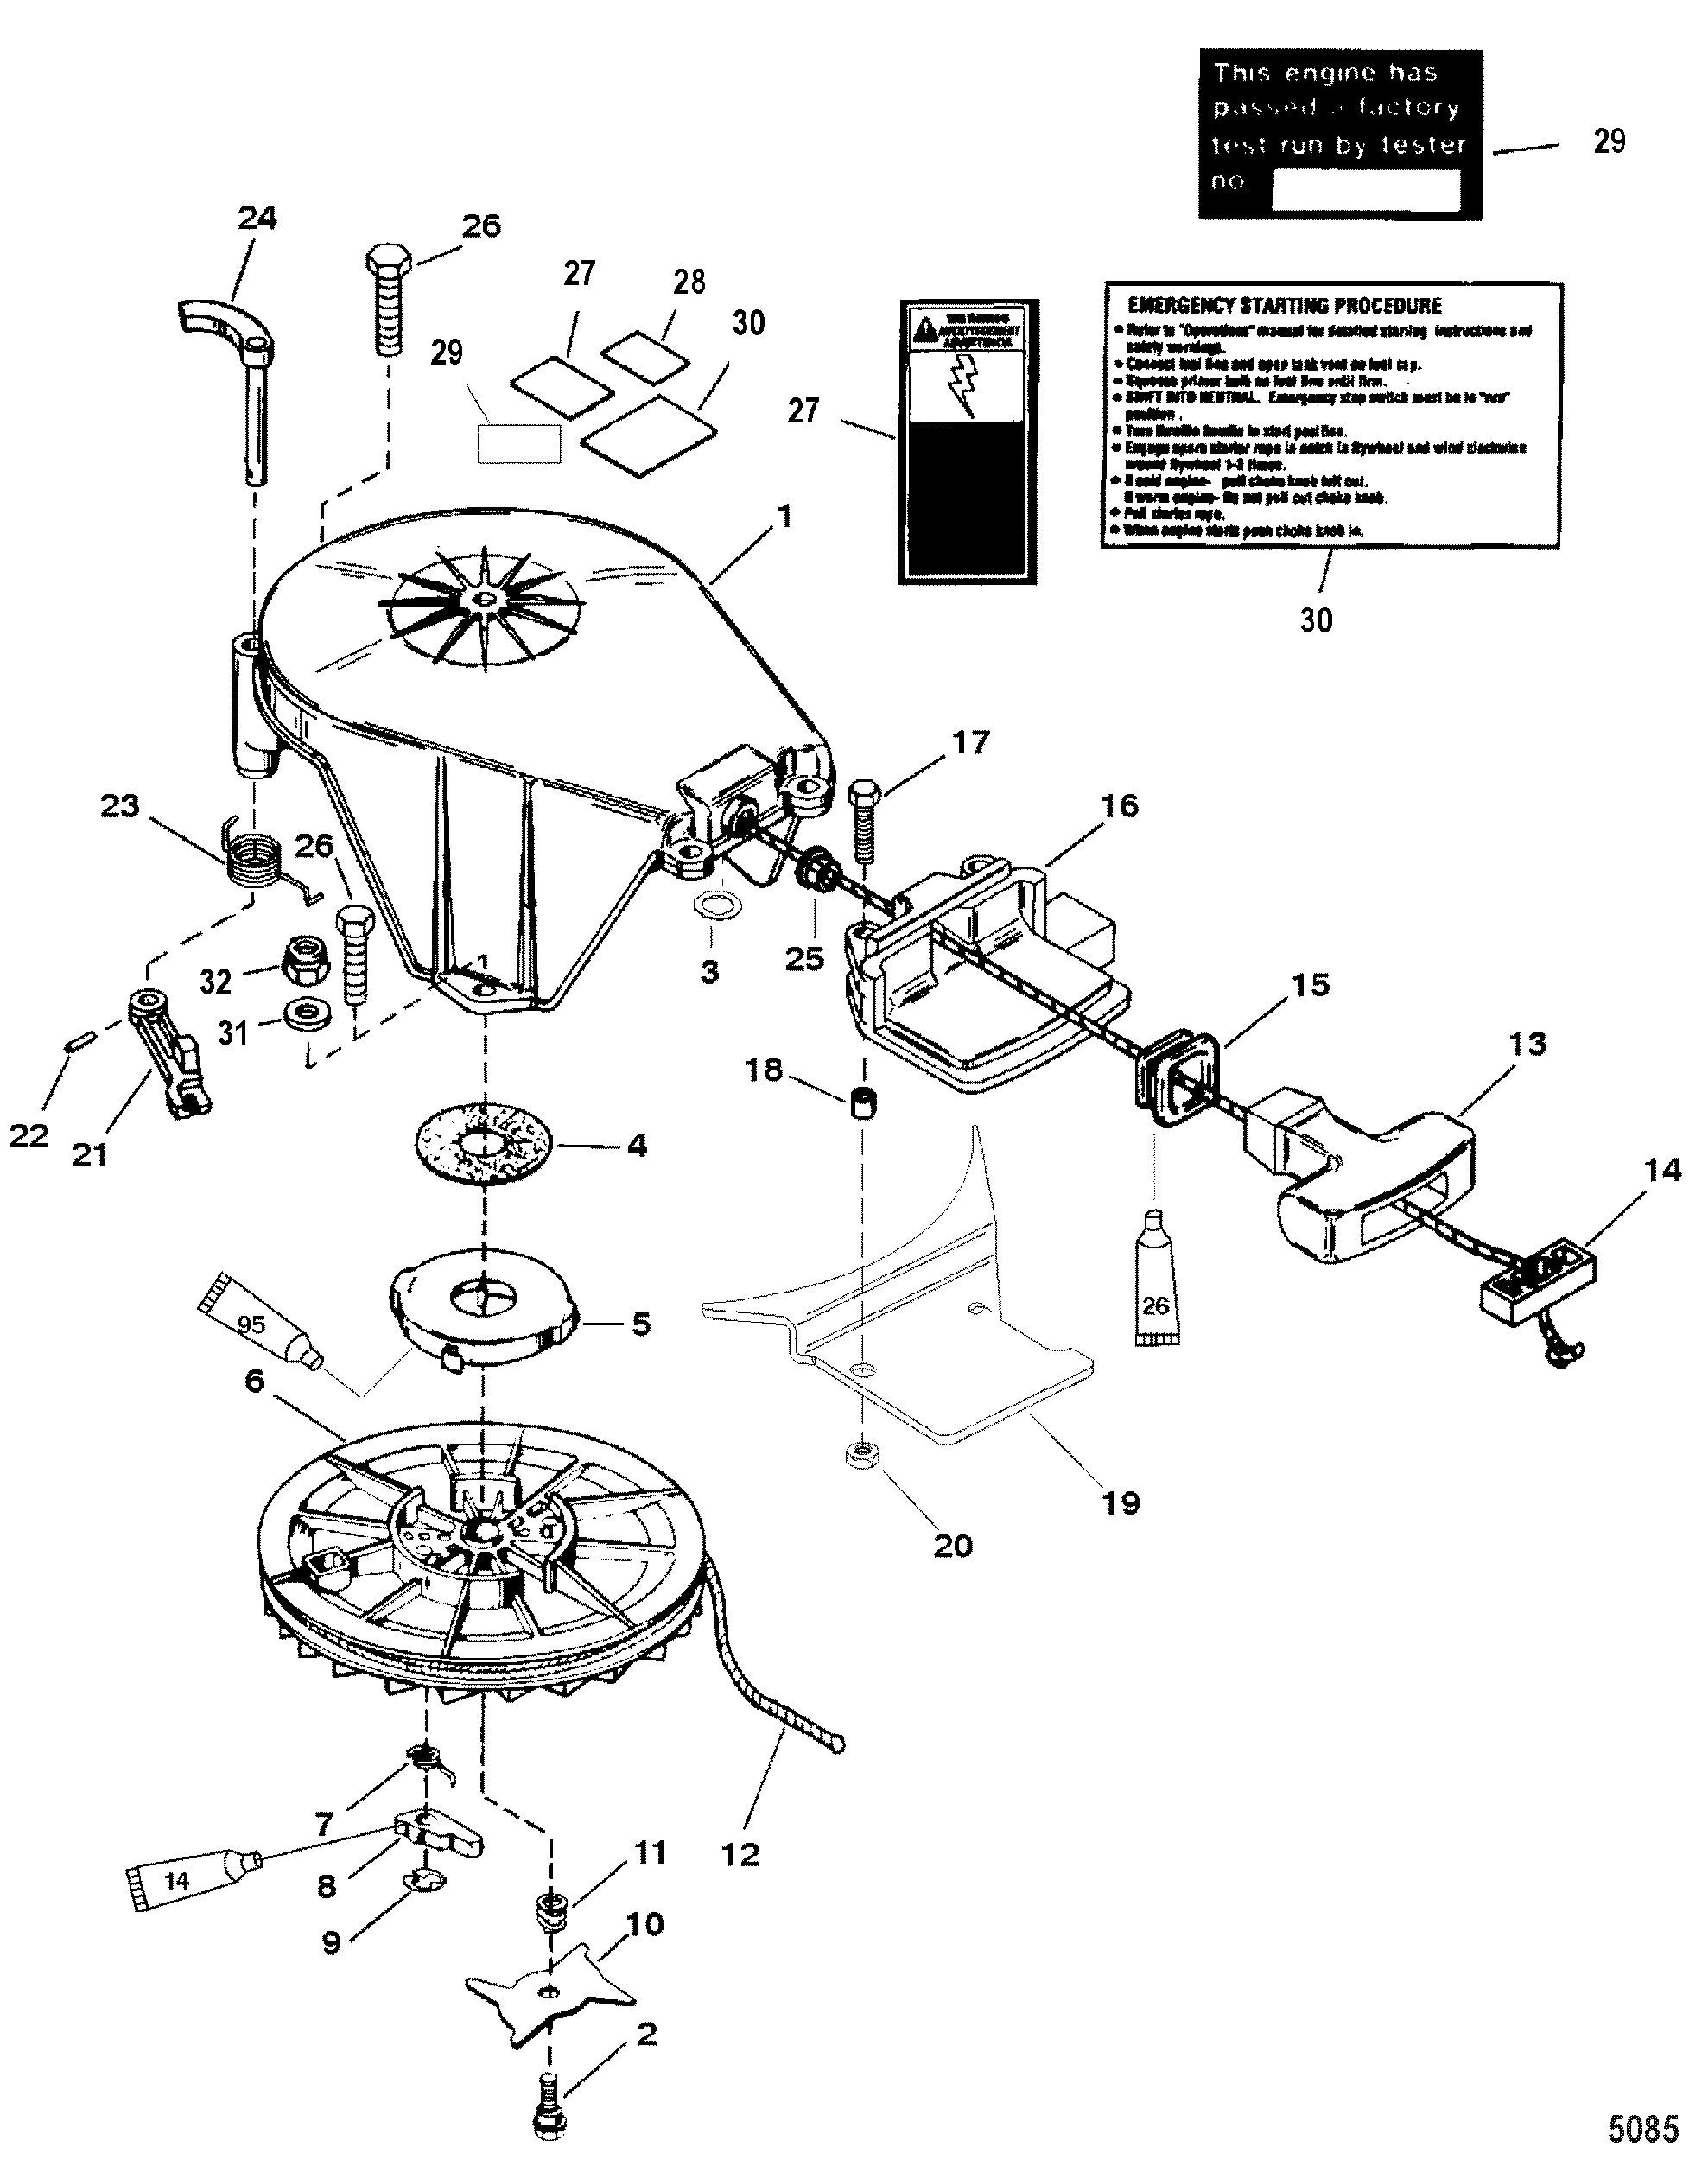 Starter Assembly(Manual) FOR MARINER / MERCURY 20/25/JET 20 - 20/25  SEAPRO/MARATHON (2-STROKE)